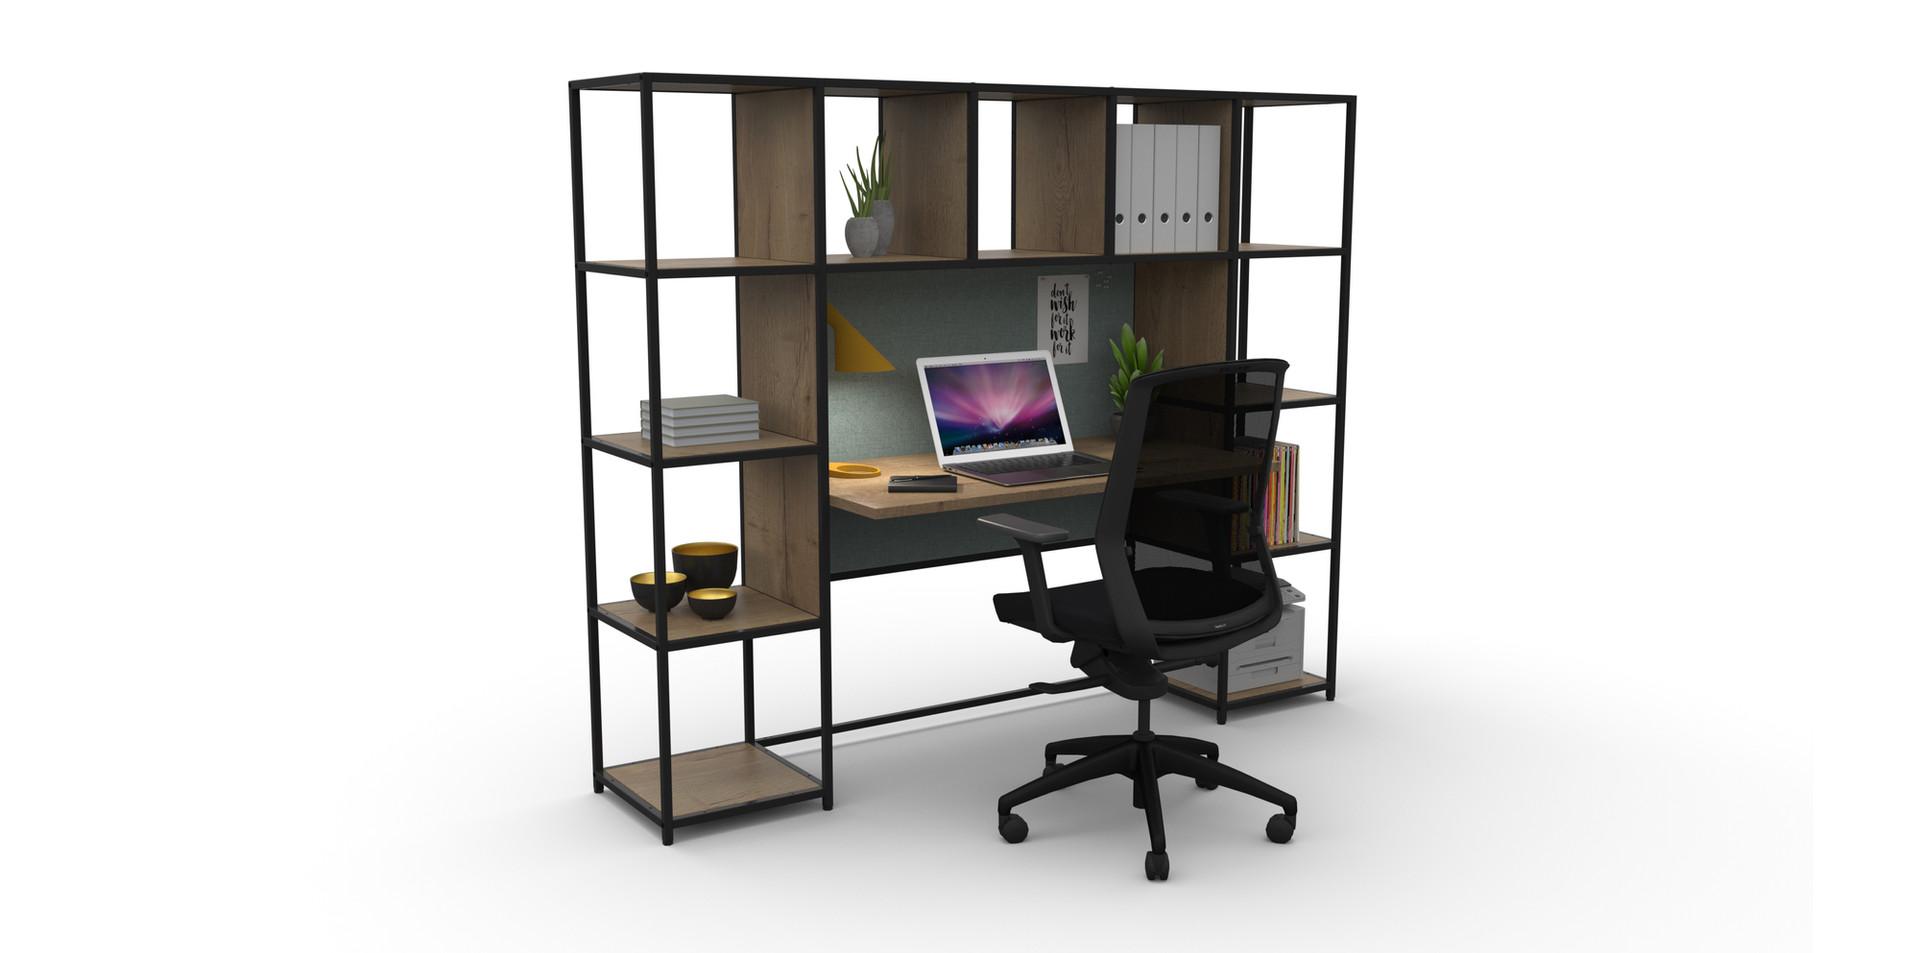 1620 x 1655h Inset Desk Unit.jpg